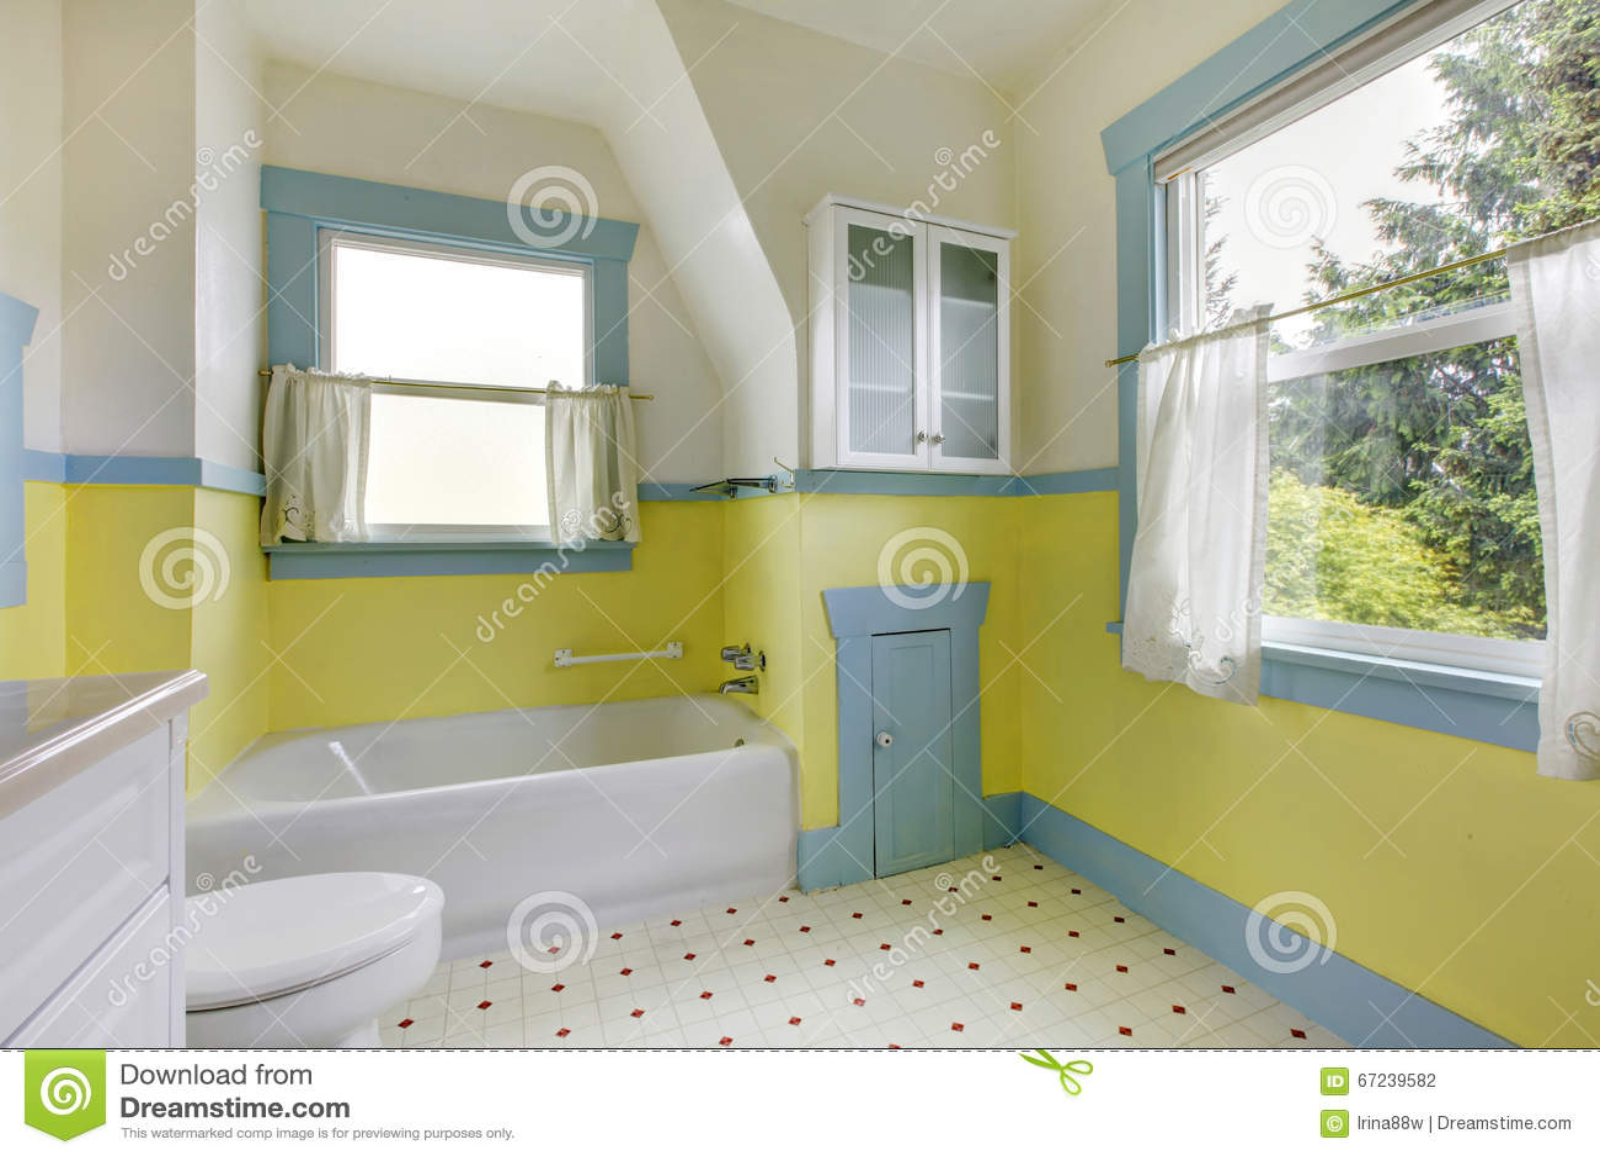 Piastrelle verdi decorate ремонт дизайн ванных комнат интерьер